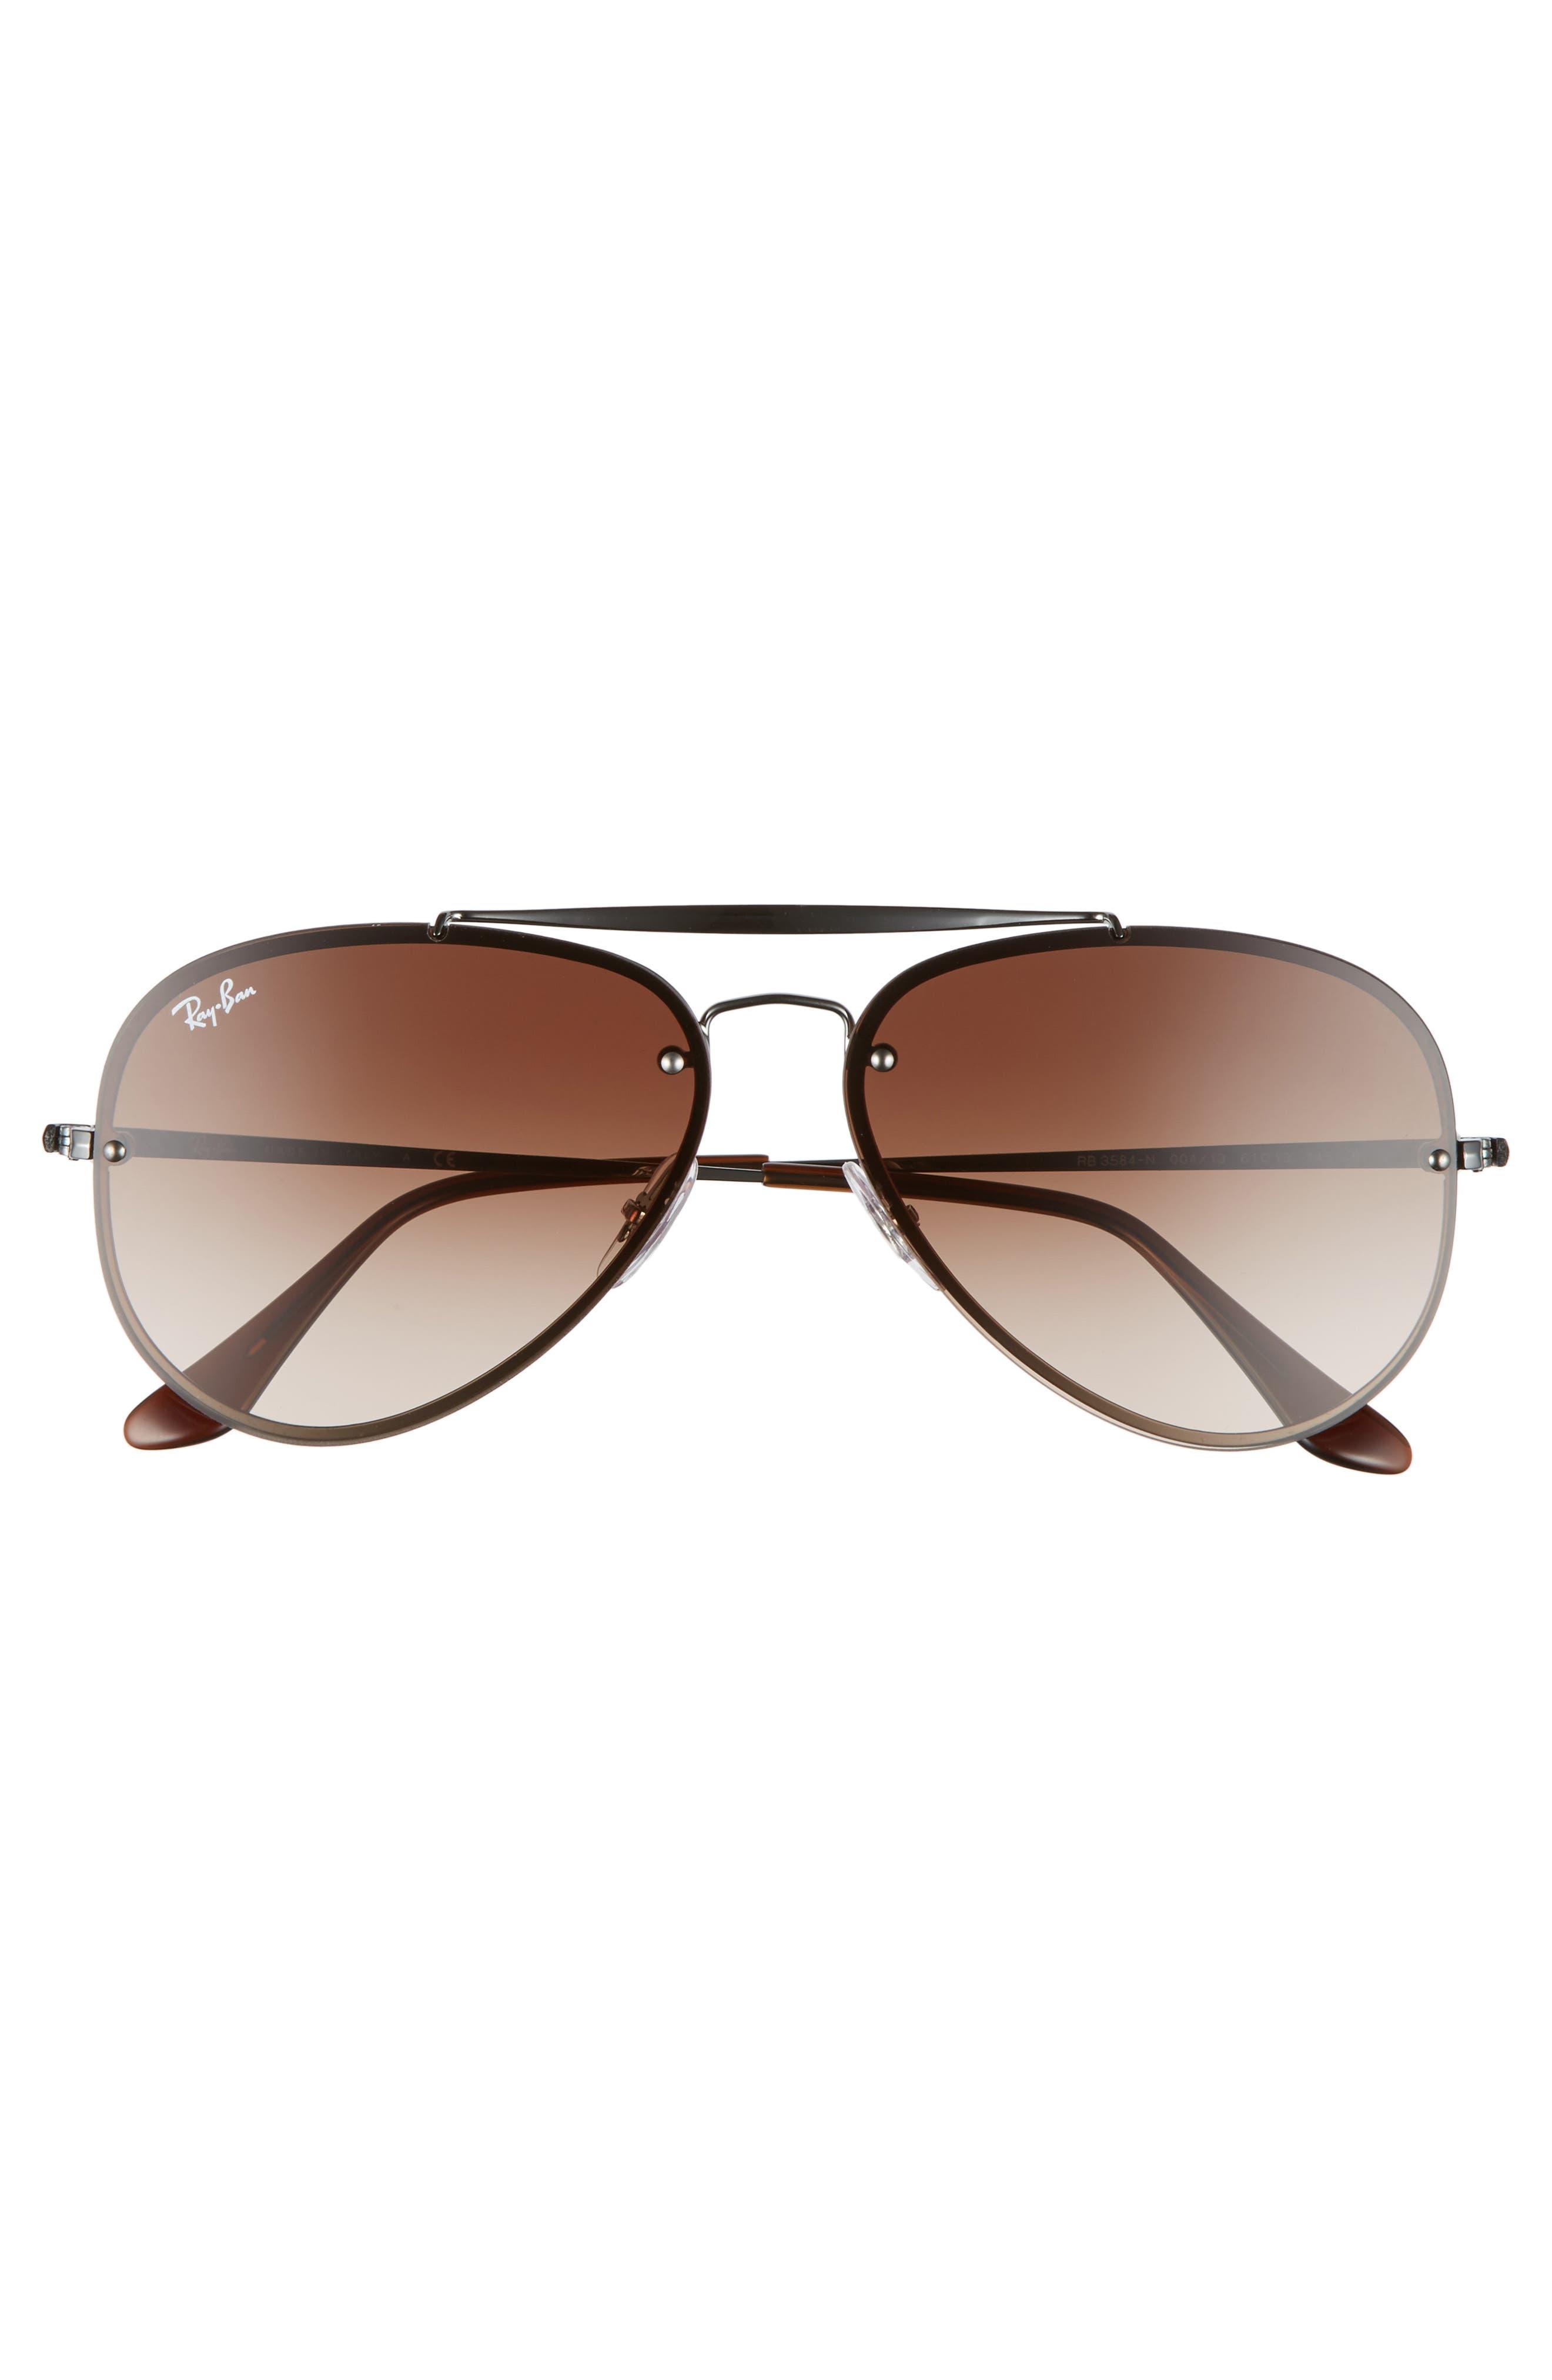 Blaze 61mm Aviator Sunglasses,                             Alternate thumbnail 2, color,                             026